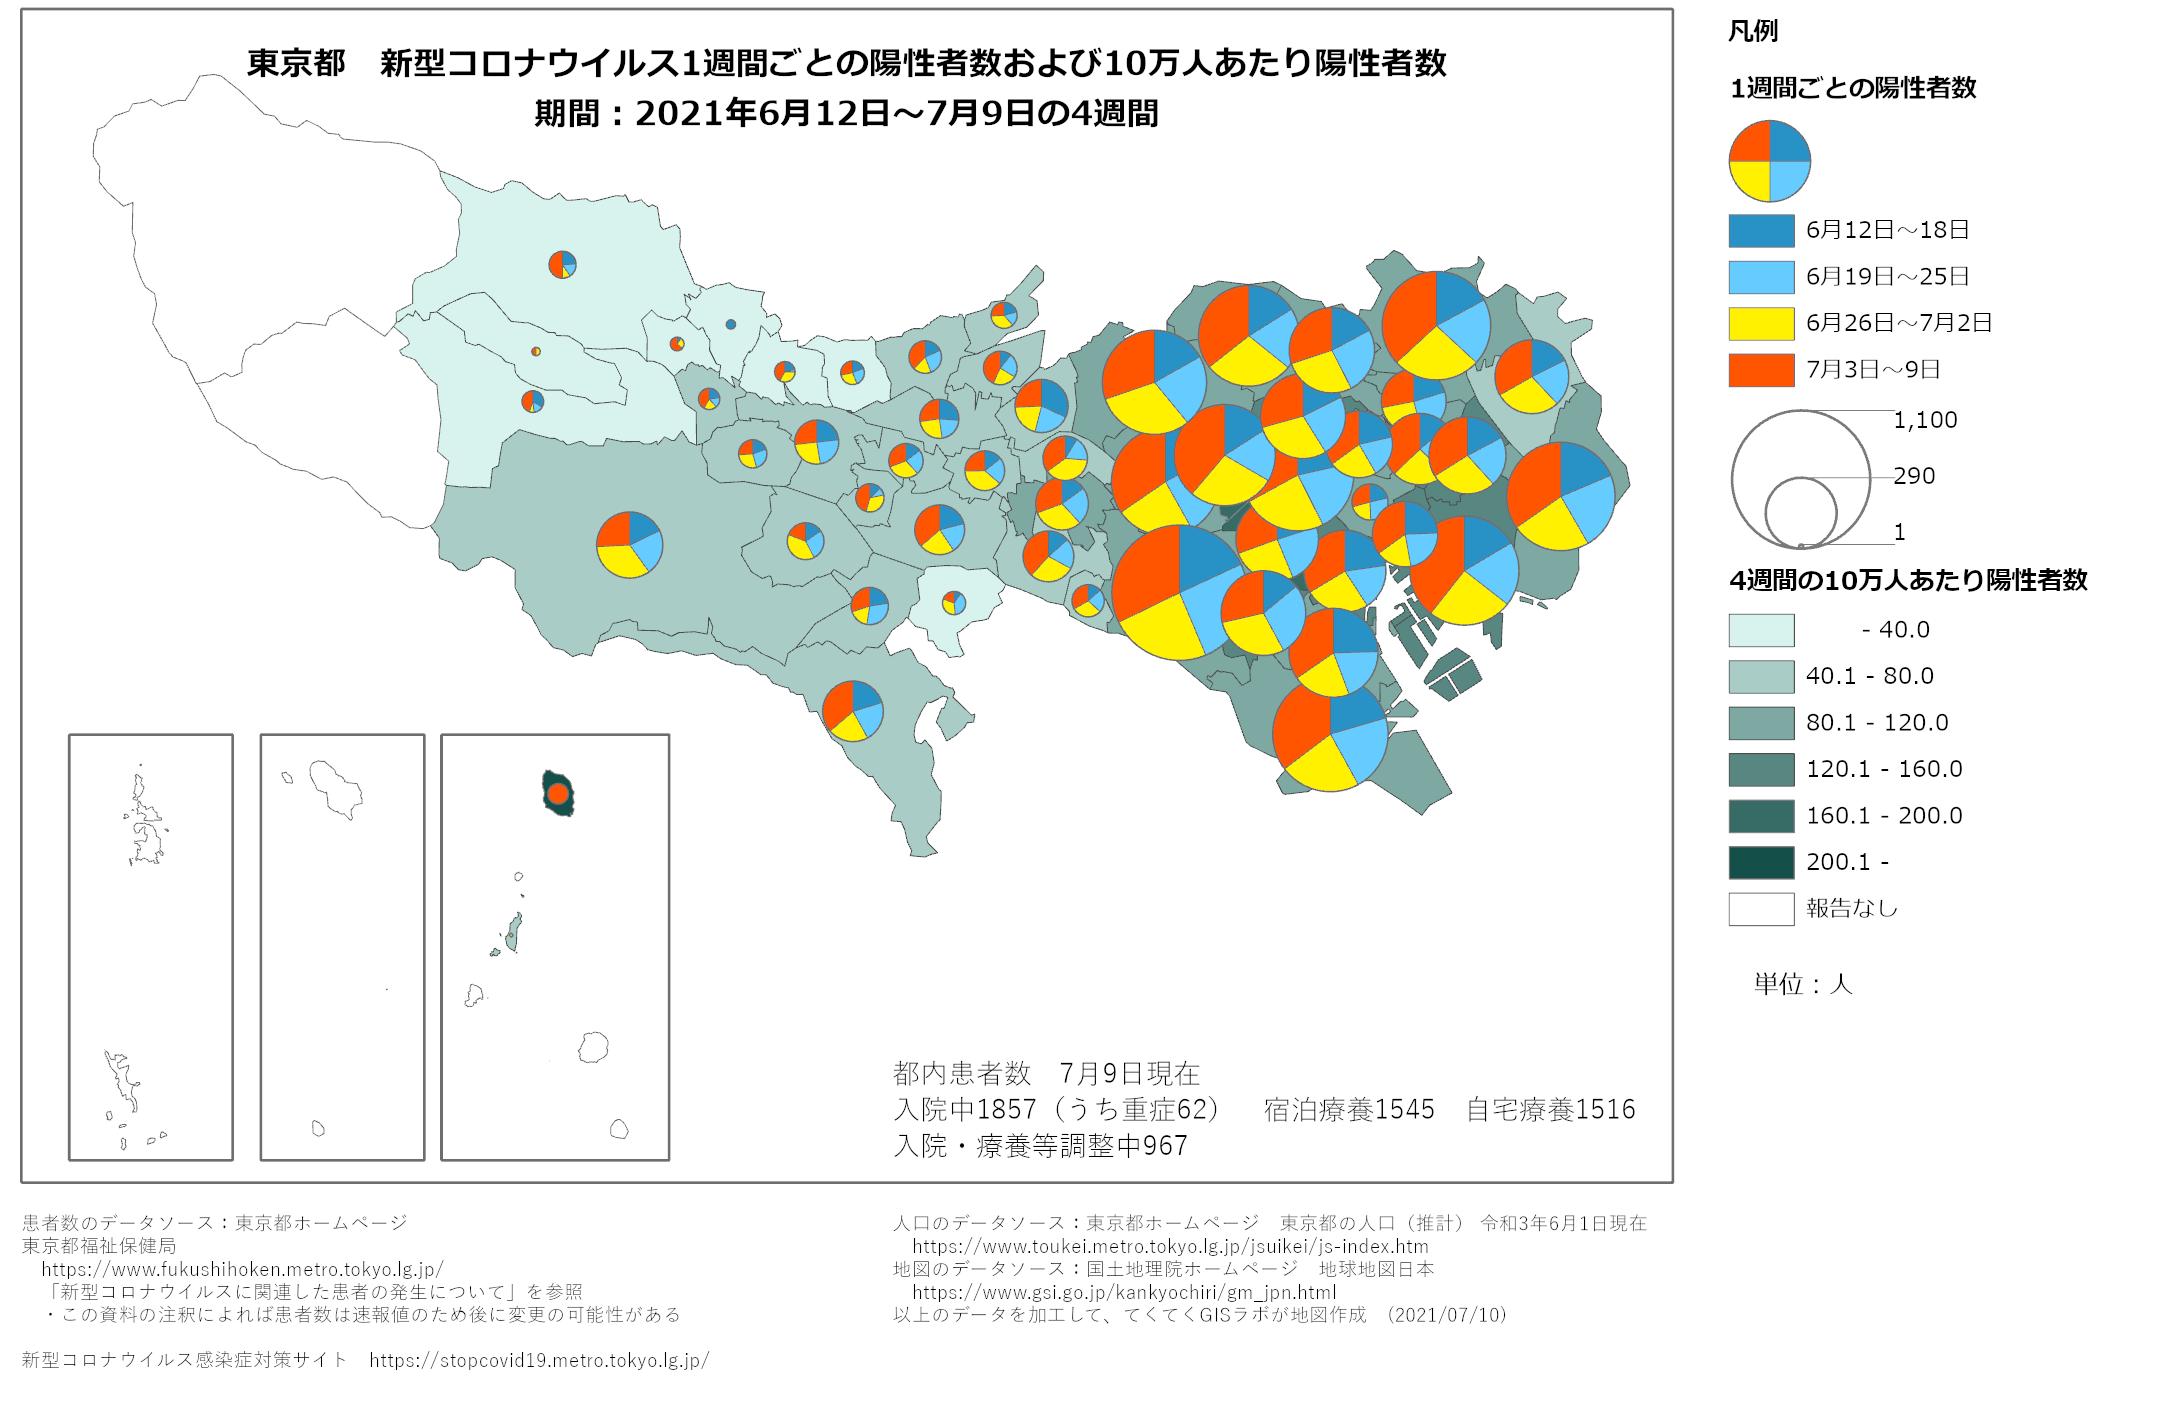 1週間ごと感染者数、東京都、6月12日〜7月9日